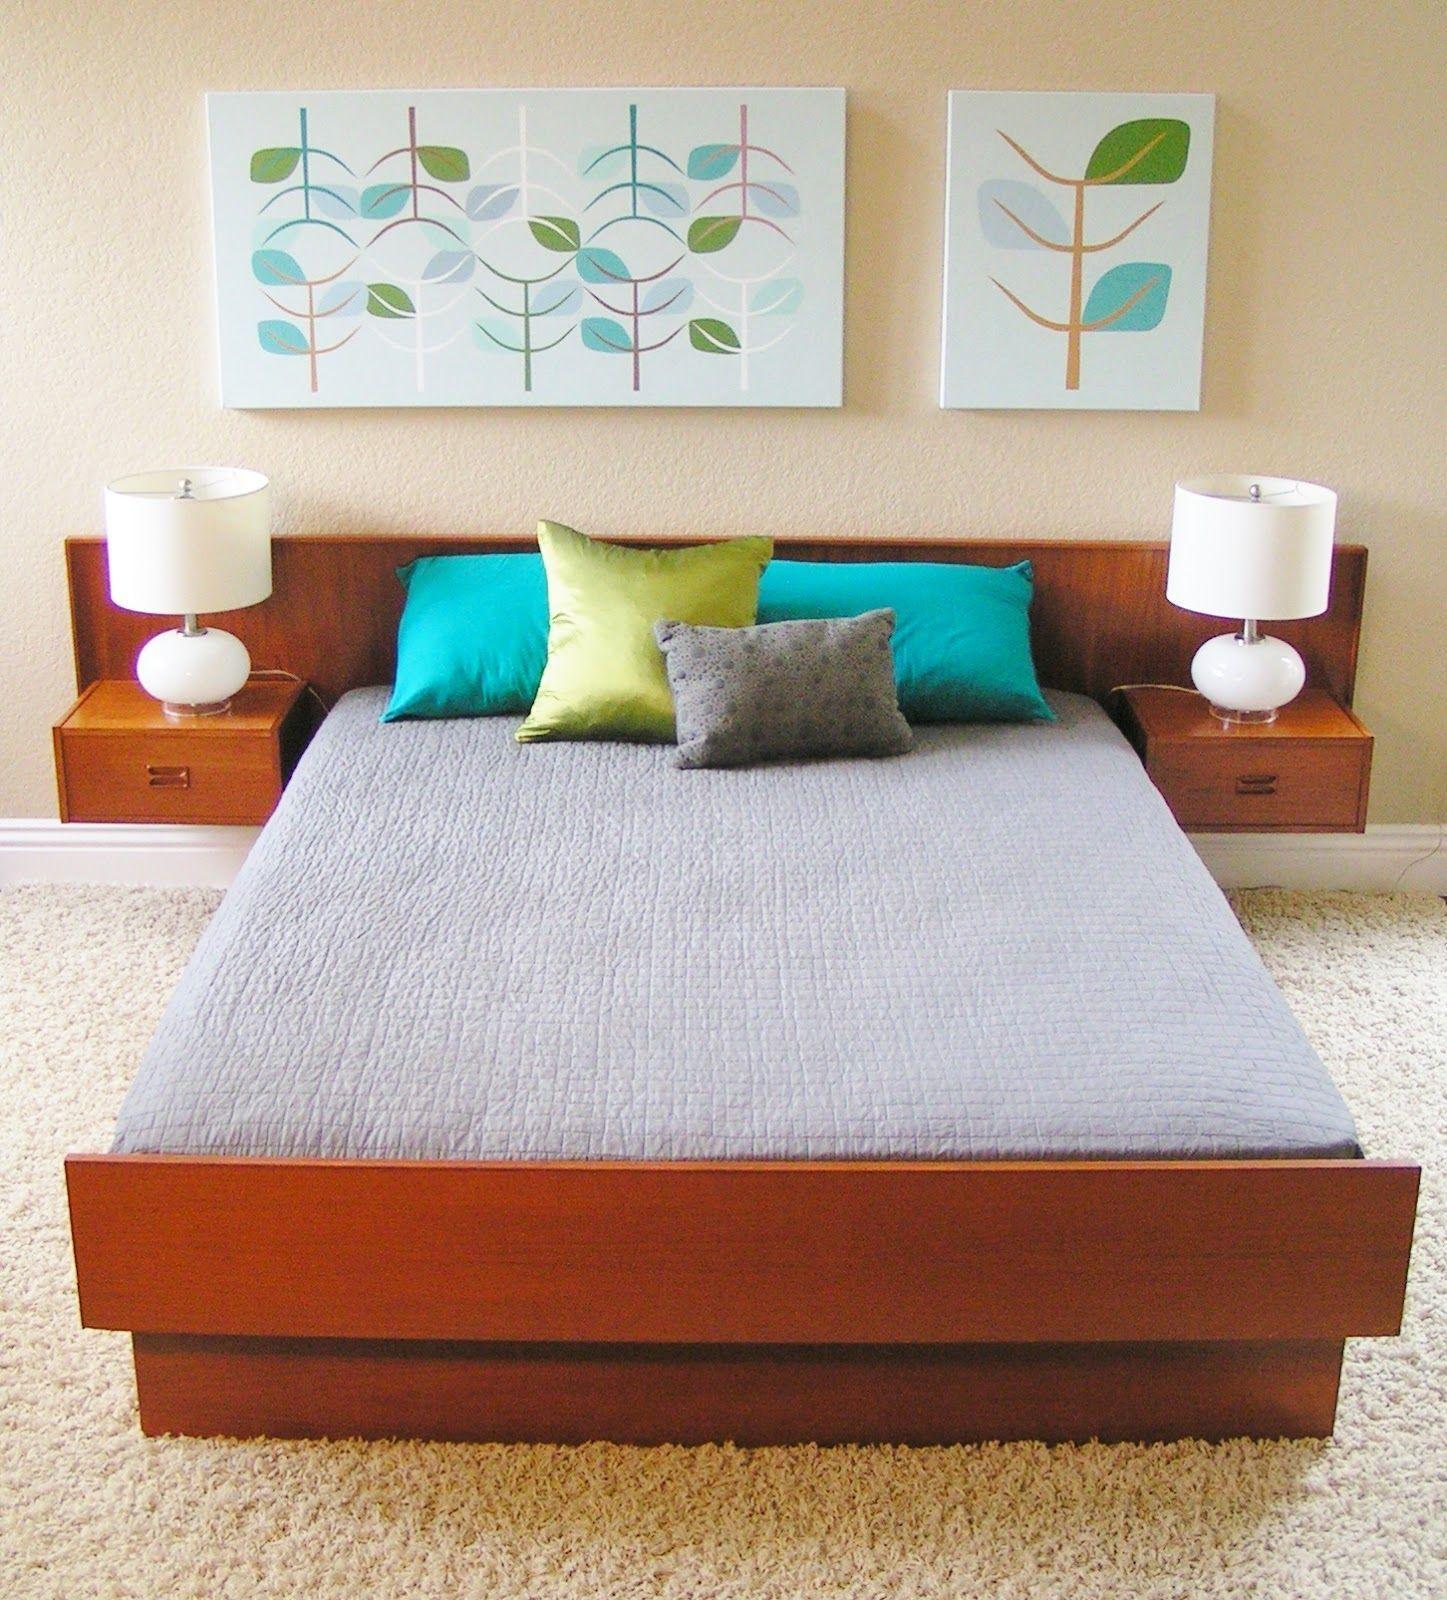 Ordinaire 20 Amazing Floating Bed Frame